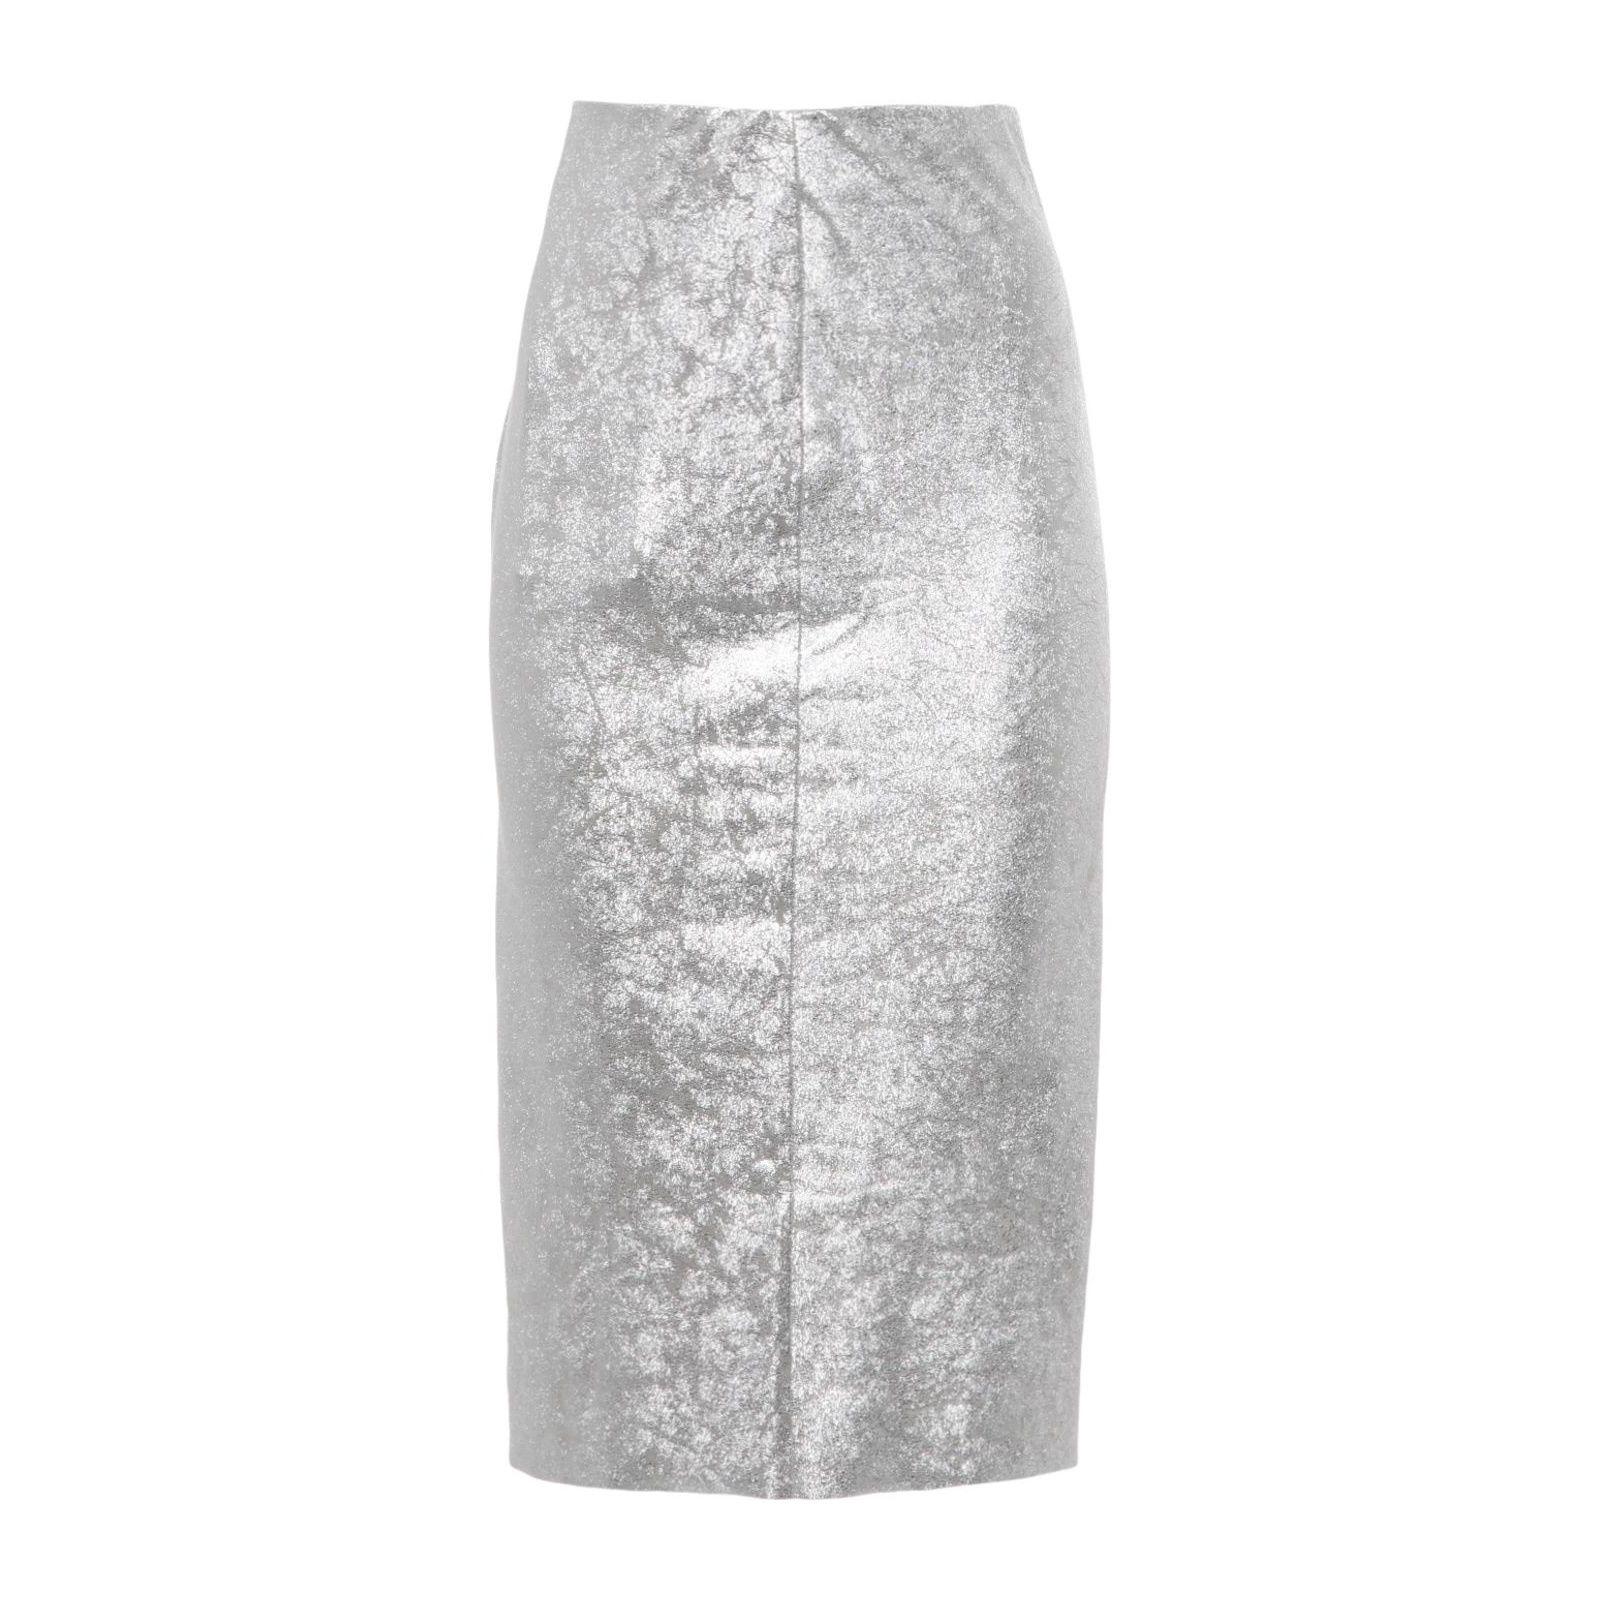 Saia Lápis Foil Silver - Prata